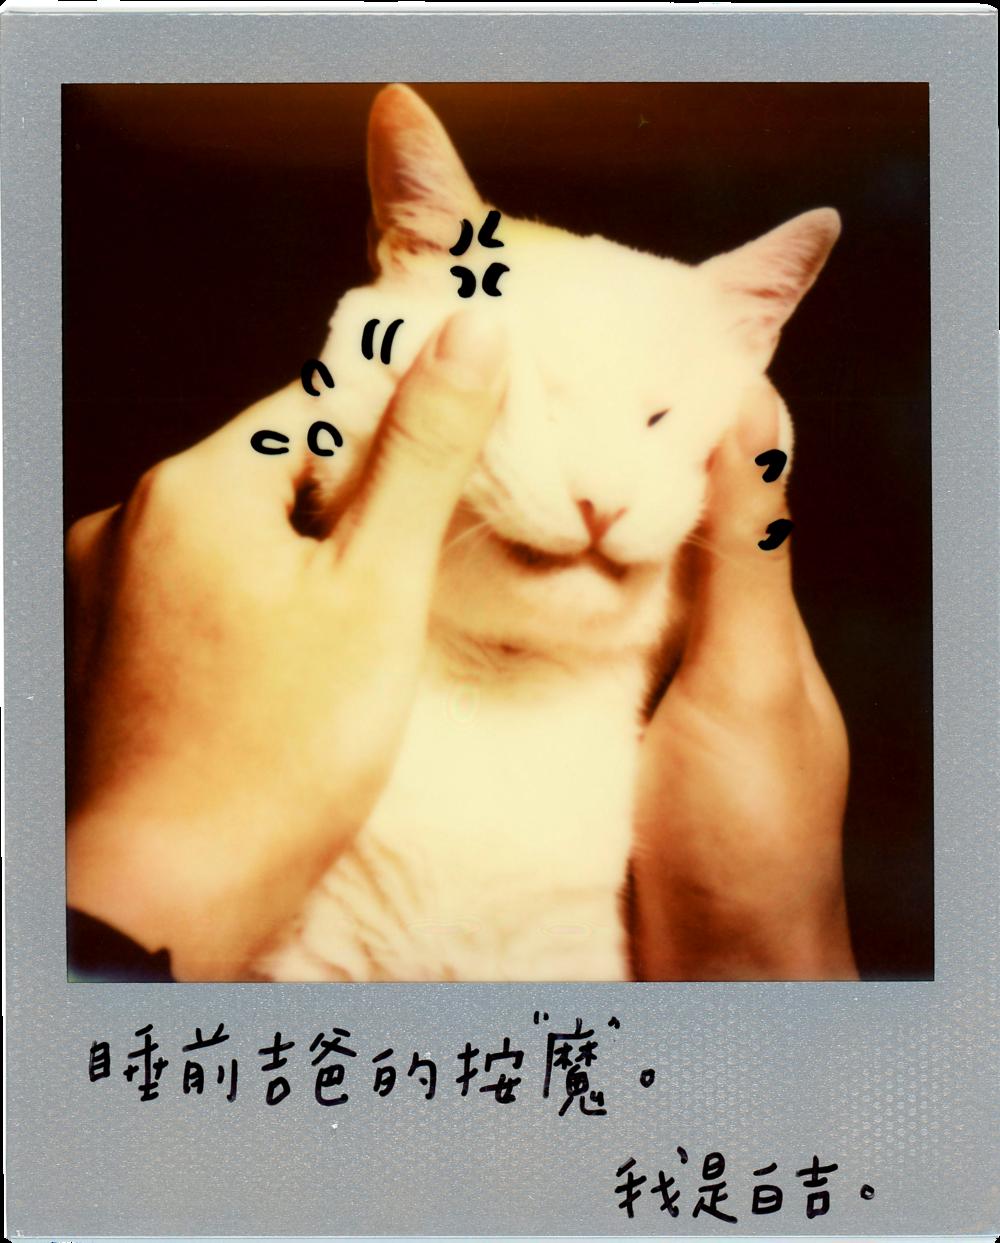 0707-2014-白吉-字3.png